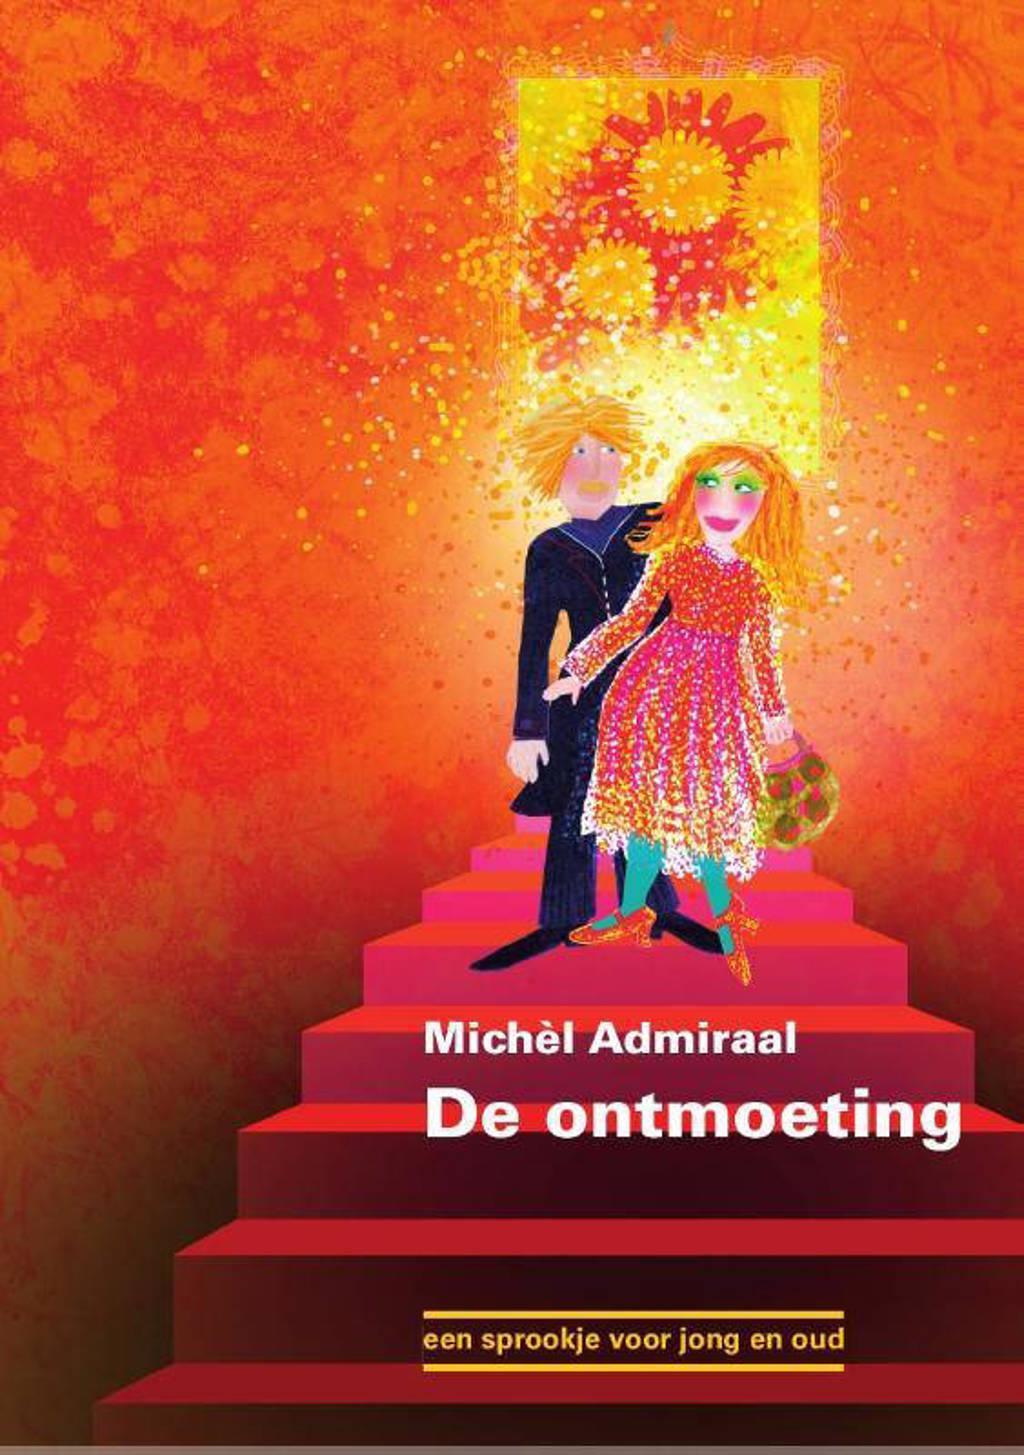 De koning en de prinses: De ontmoeting - Michèl Admiraal